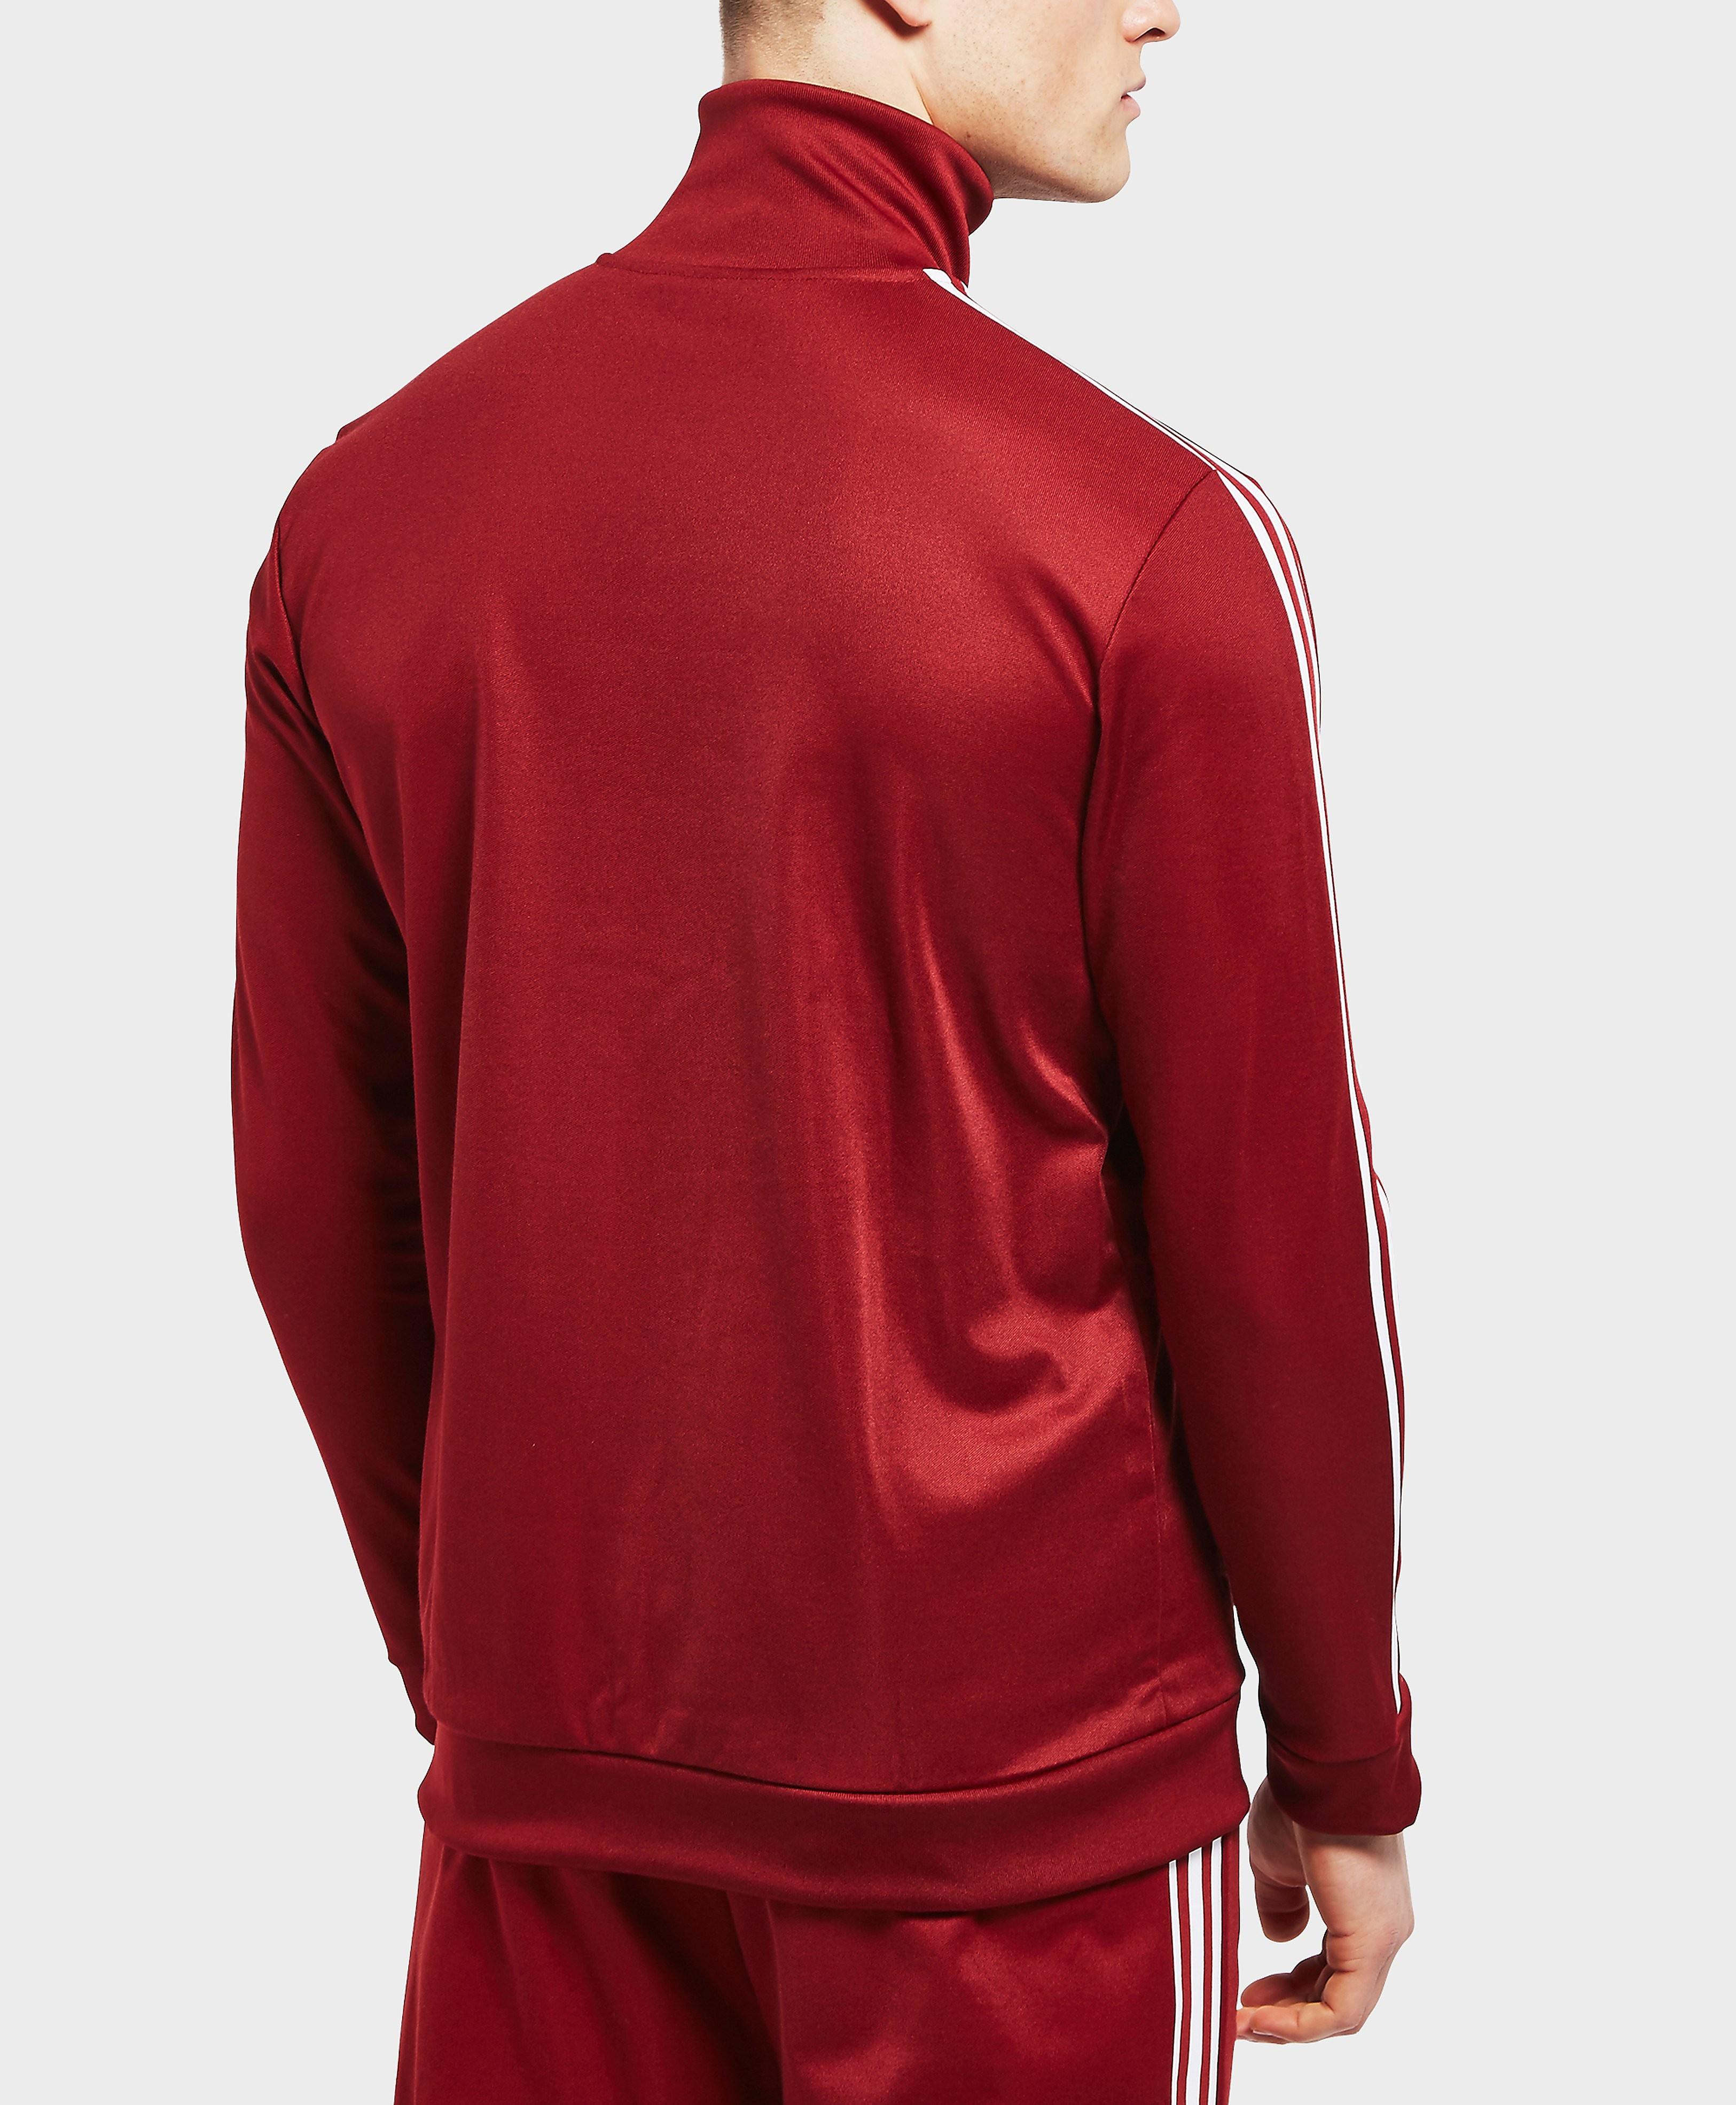 adidas Originals Beckenbauer Full Zip Track Top